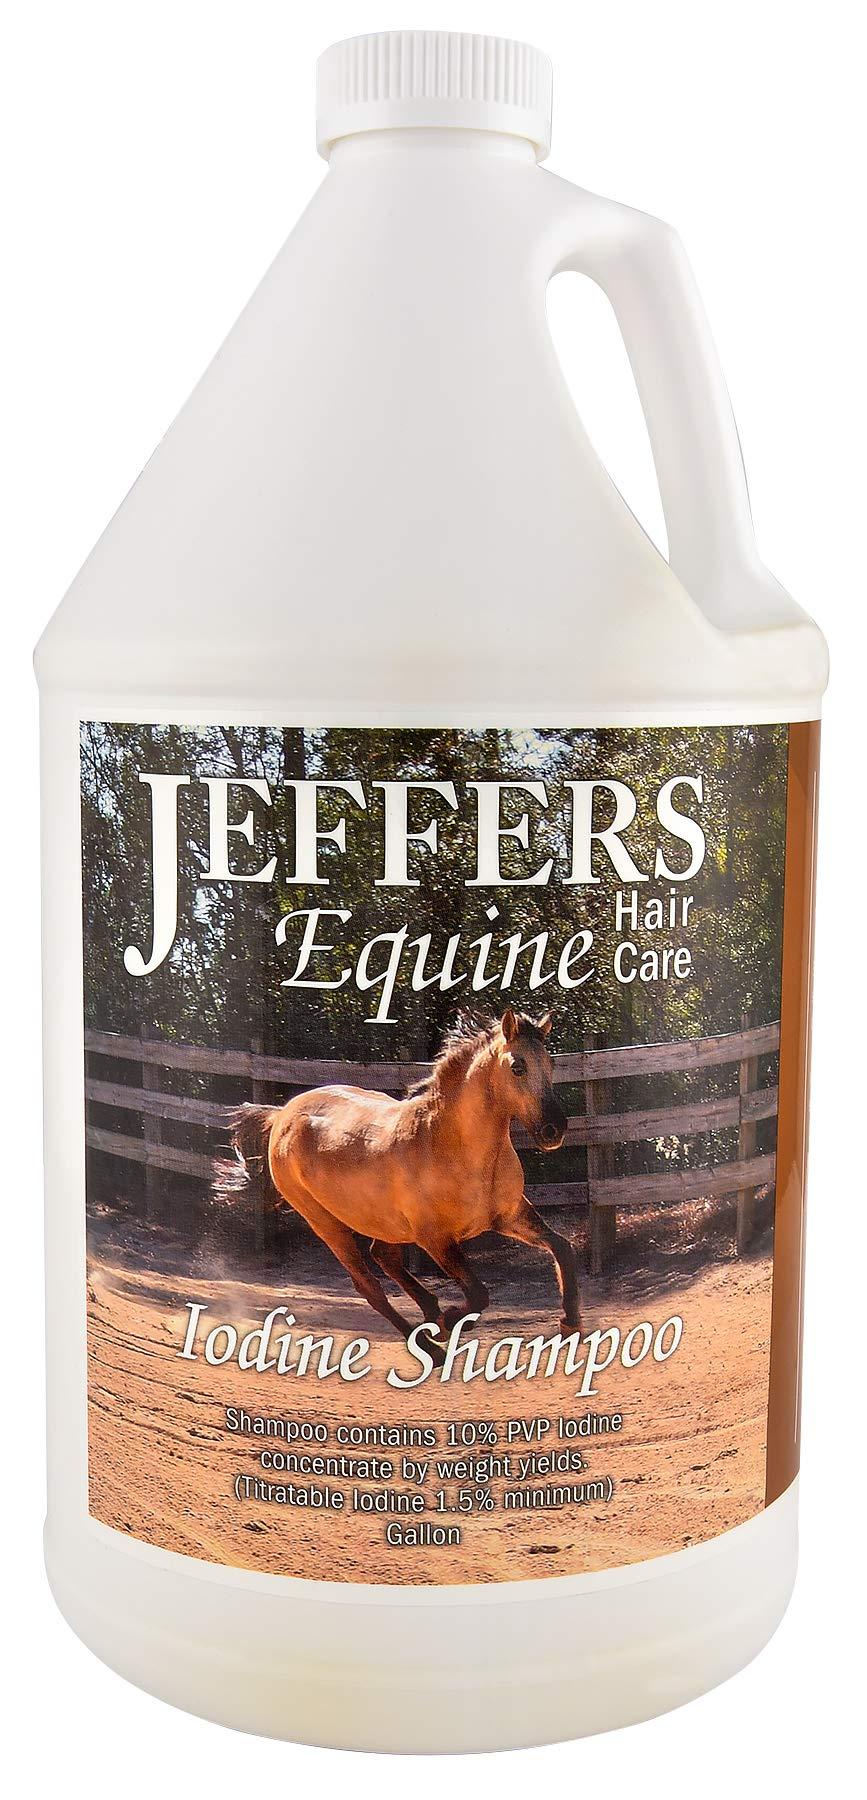 Jeffers Iodine Medicated Shampoo, Gallon by Jeffers